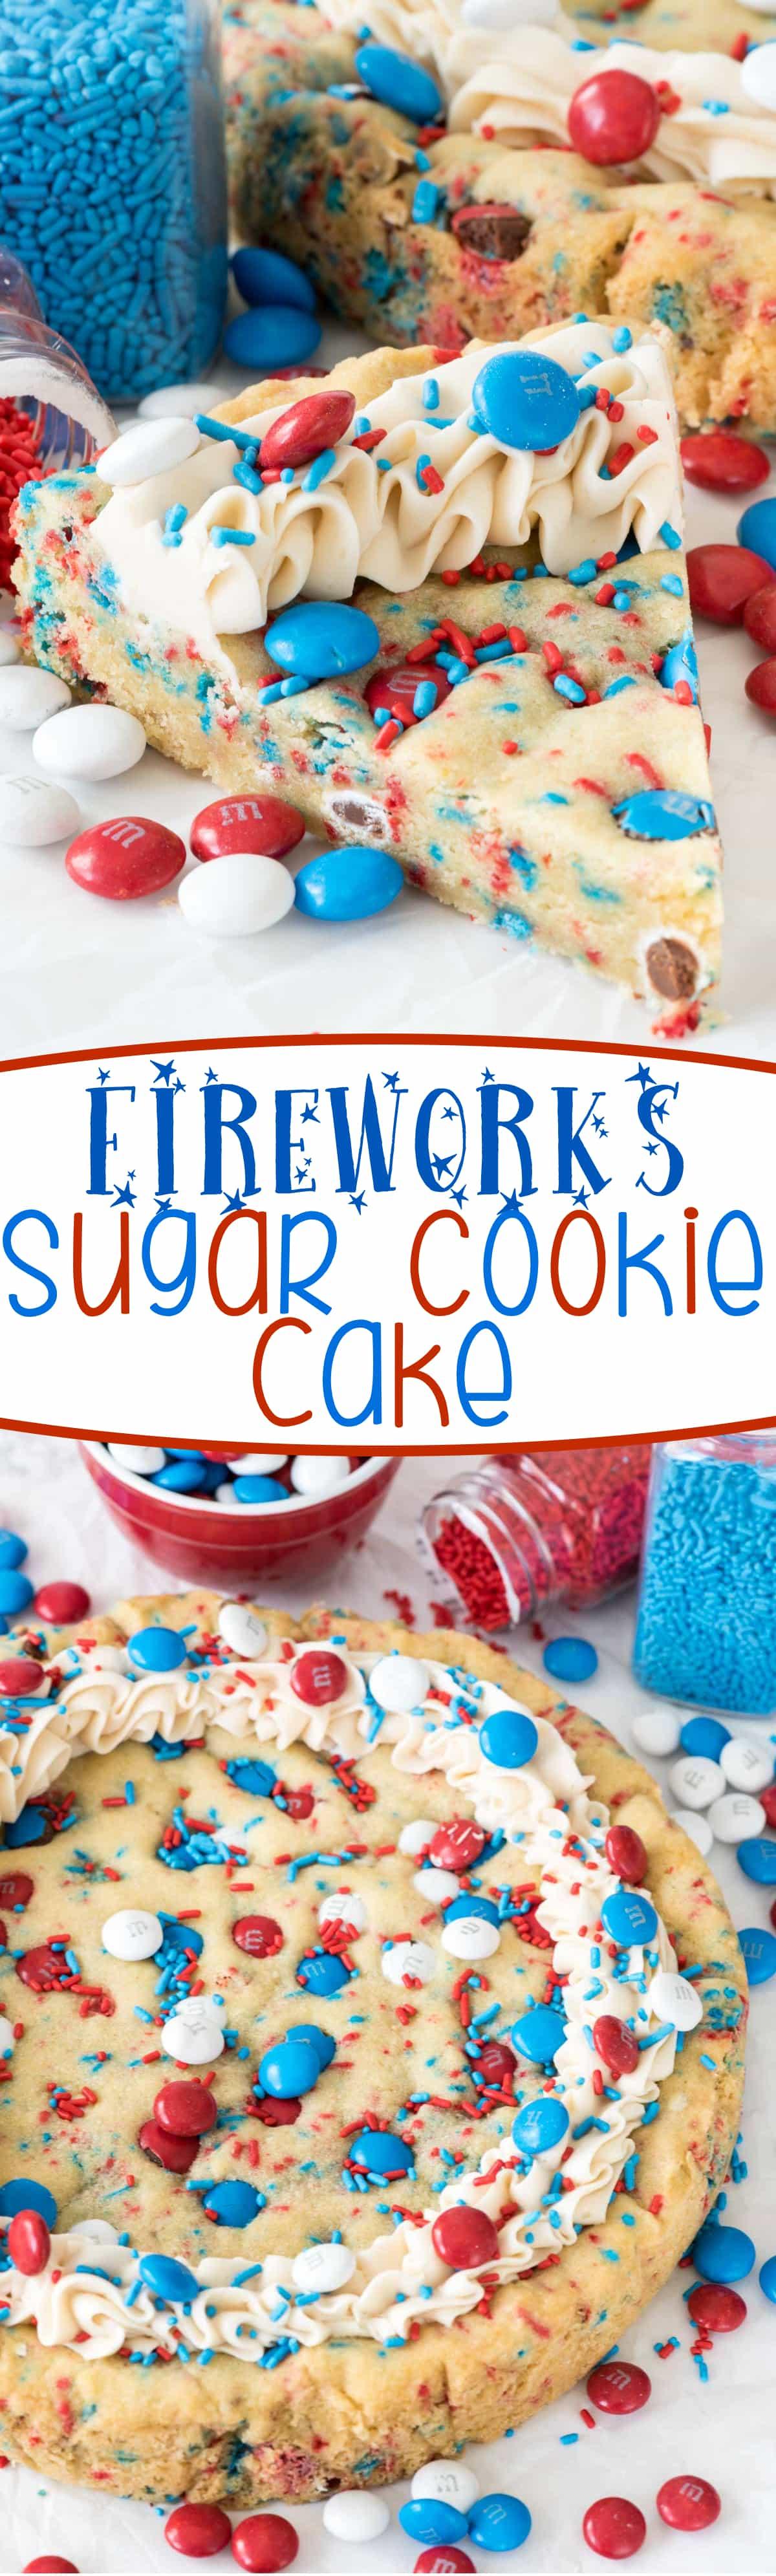 Fireworks Sugar Cookie Cake Recipe - this EASY sugar cookie recipe is ...